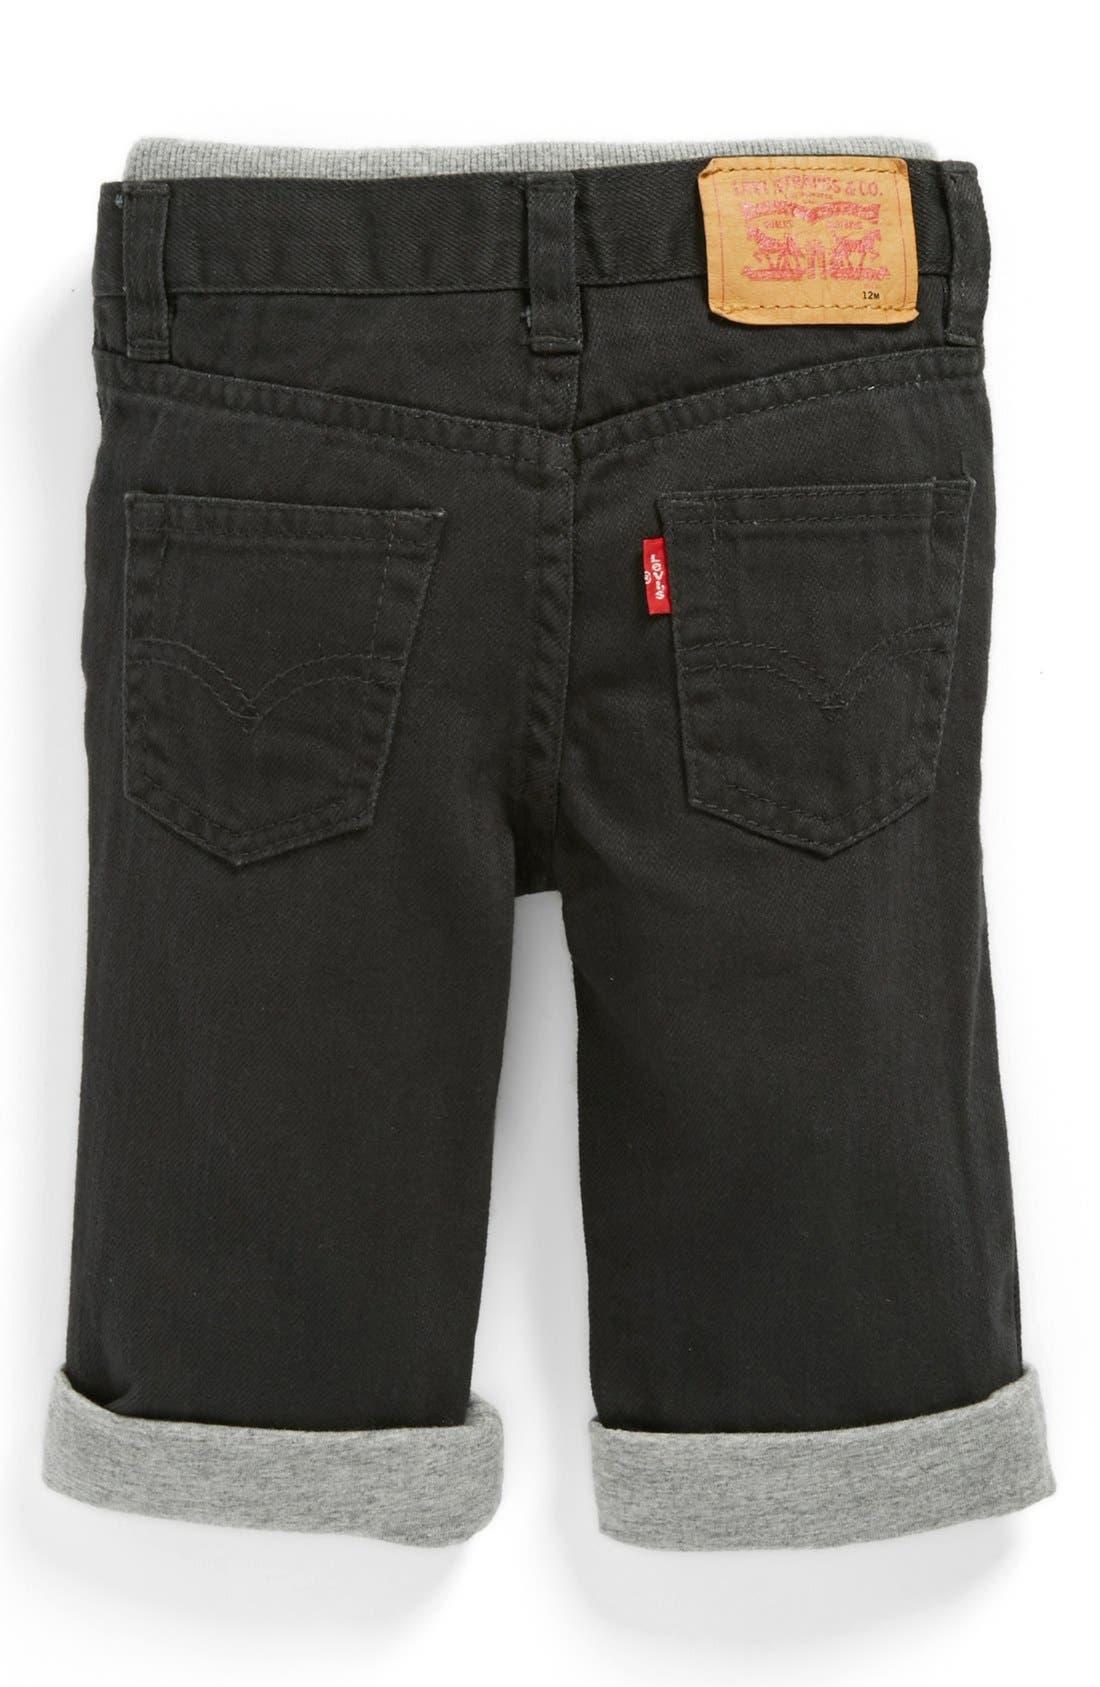 Alternate Image 1 Selected - Levi's® '514™' Straight Leg Jeans (Baby)